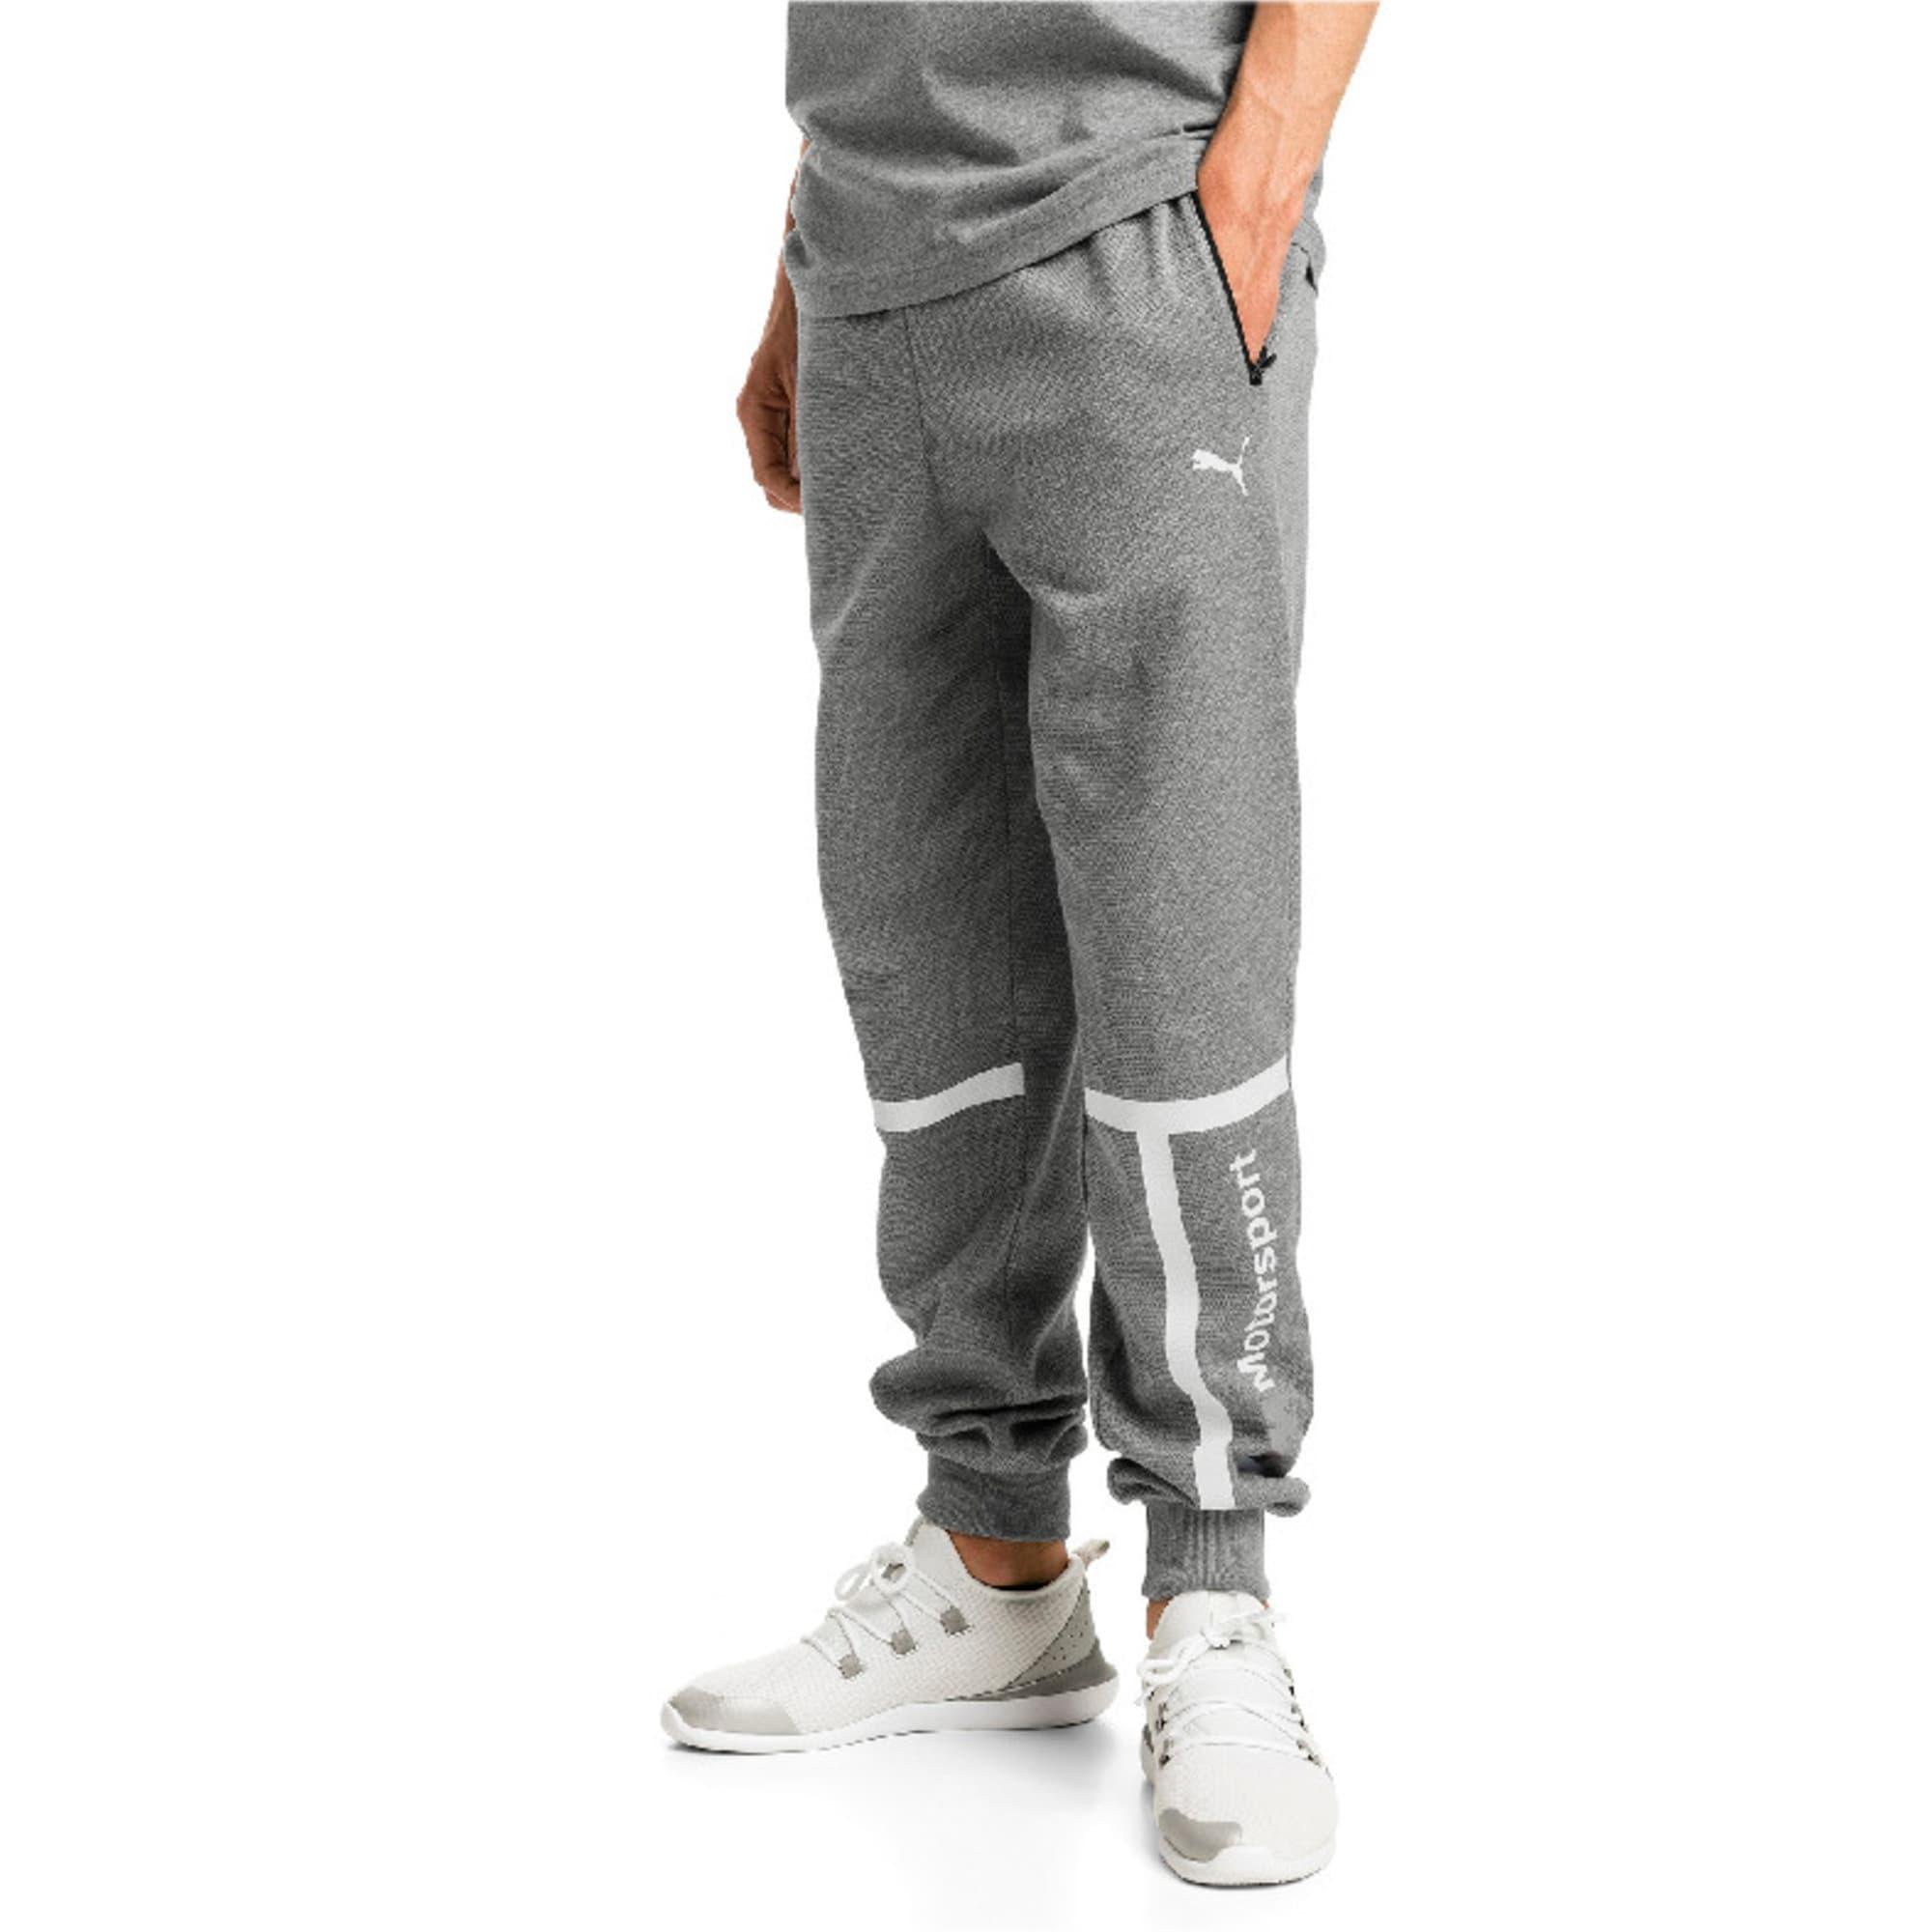 Thumbnail 1 of BMW Motorsport Knitted Men's Sweatpants, Medium Gray Heather, medium-IND